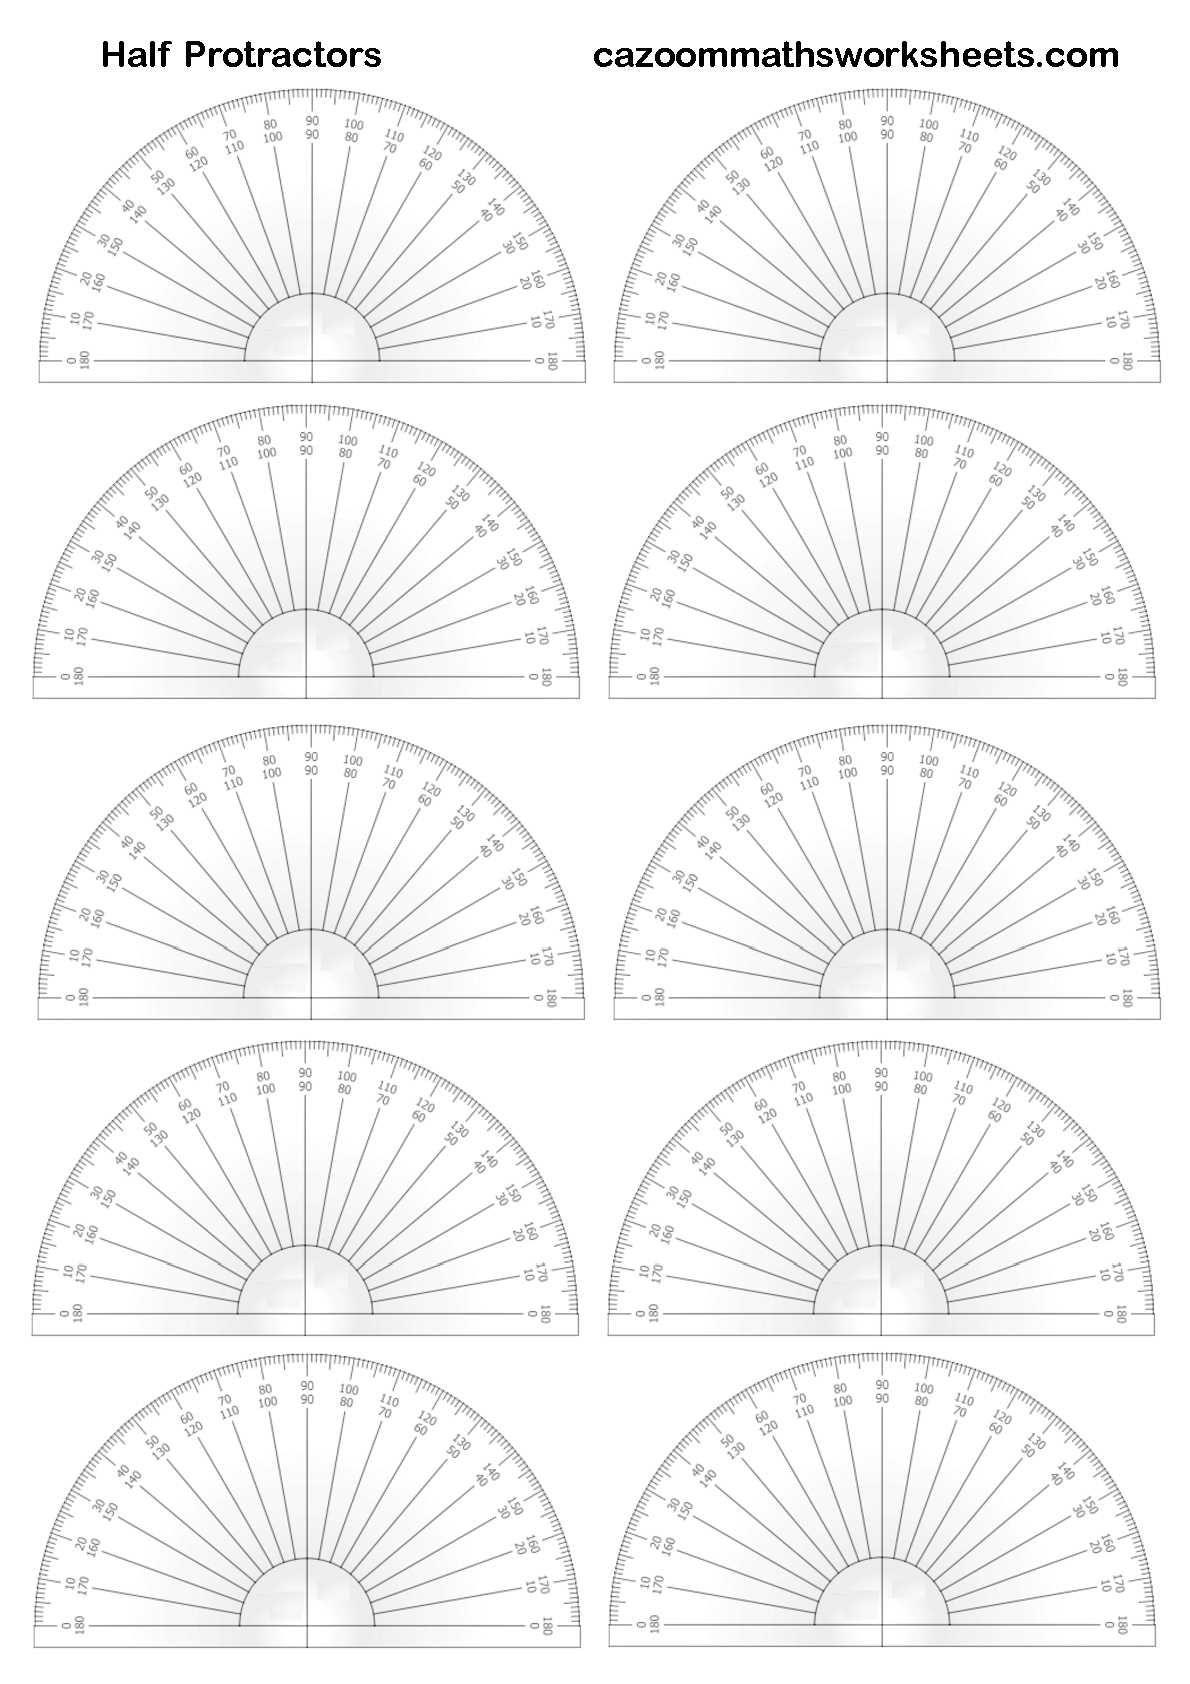 image regarding Free Printable Protractor titled Printable 50 percent Protractors MATH Protractor, No cost math